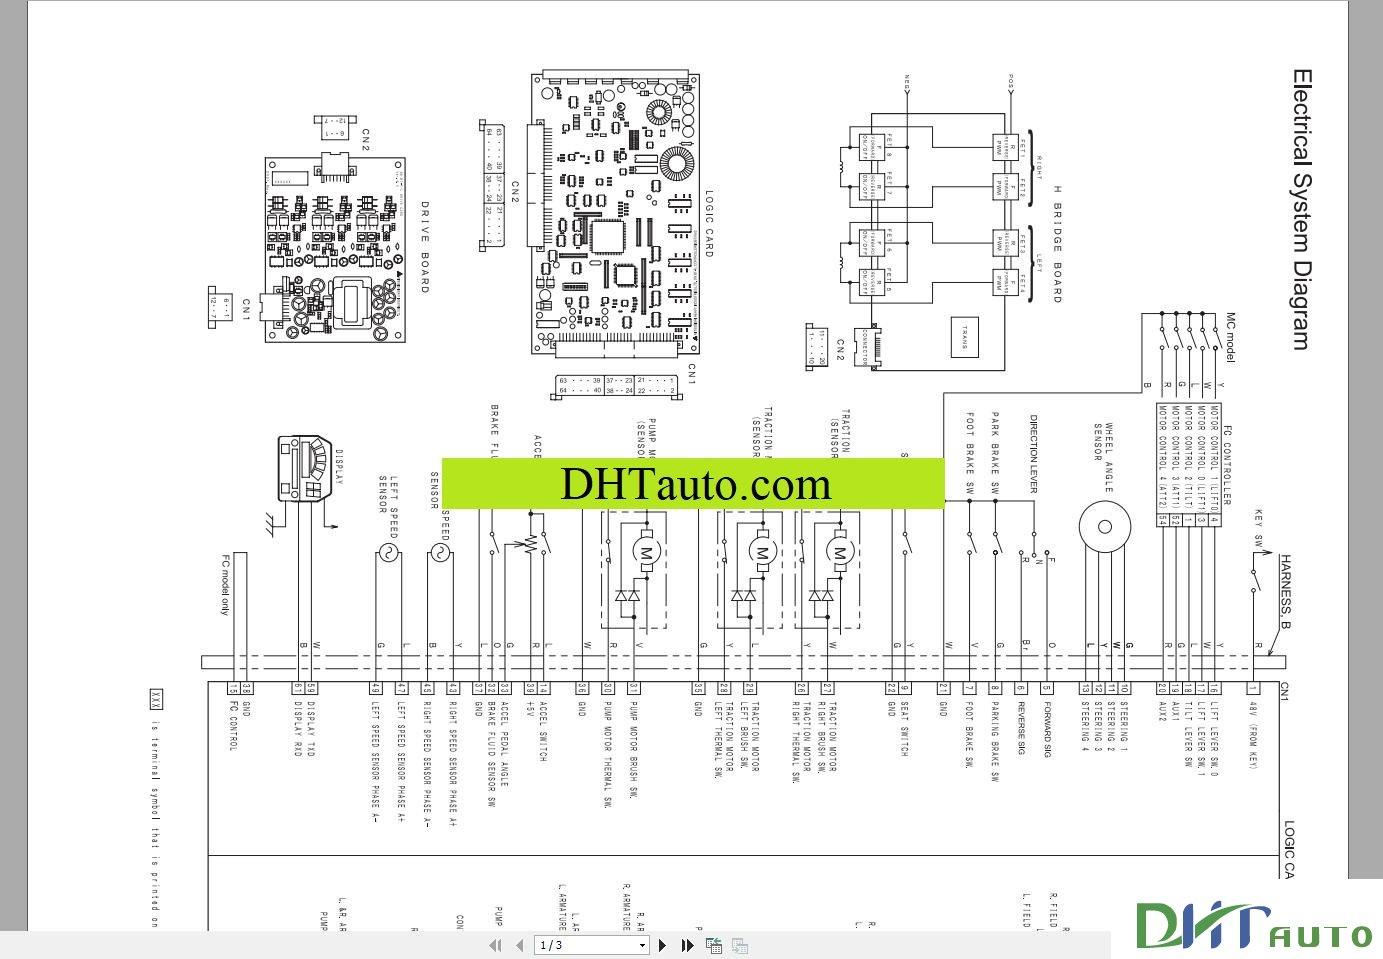 [DIAGRAM] For A Mitsubishi Fork Lift Wiring Diagrams FULL